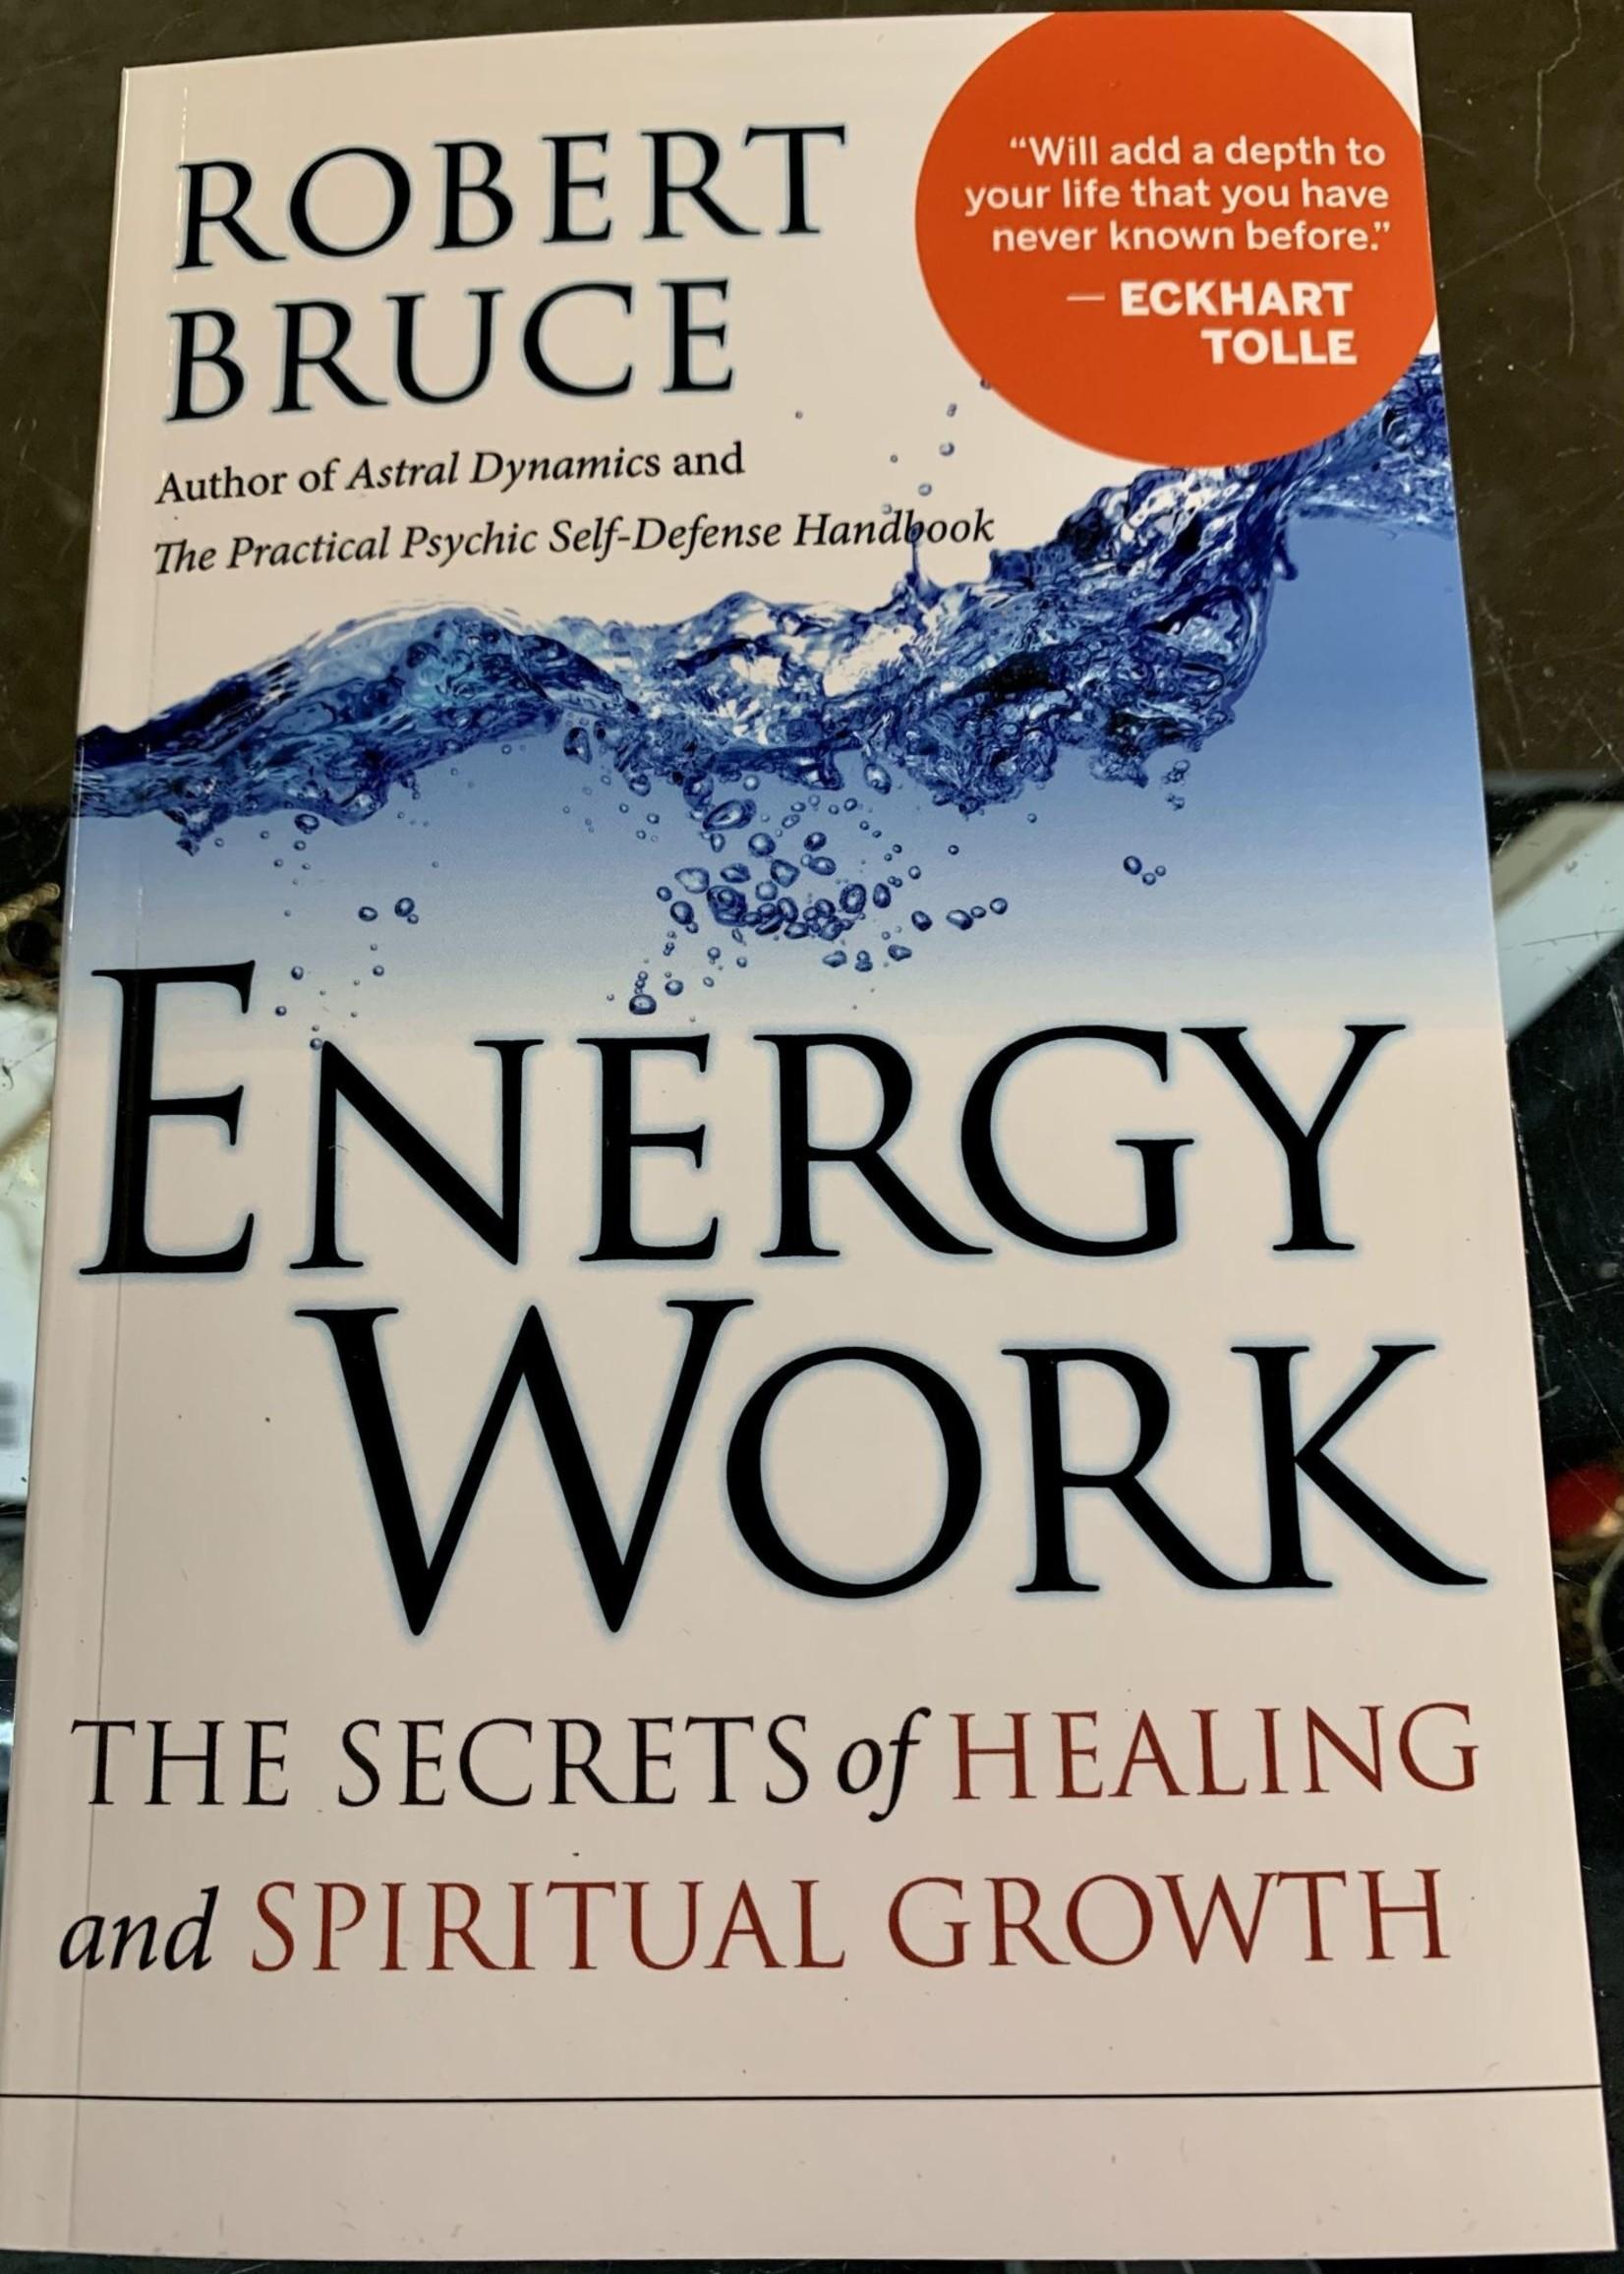 Energy Work The Secrets of Healing and Spiritual Growth - Robert Bruce